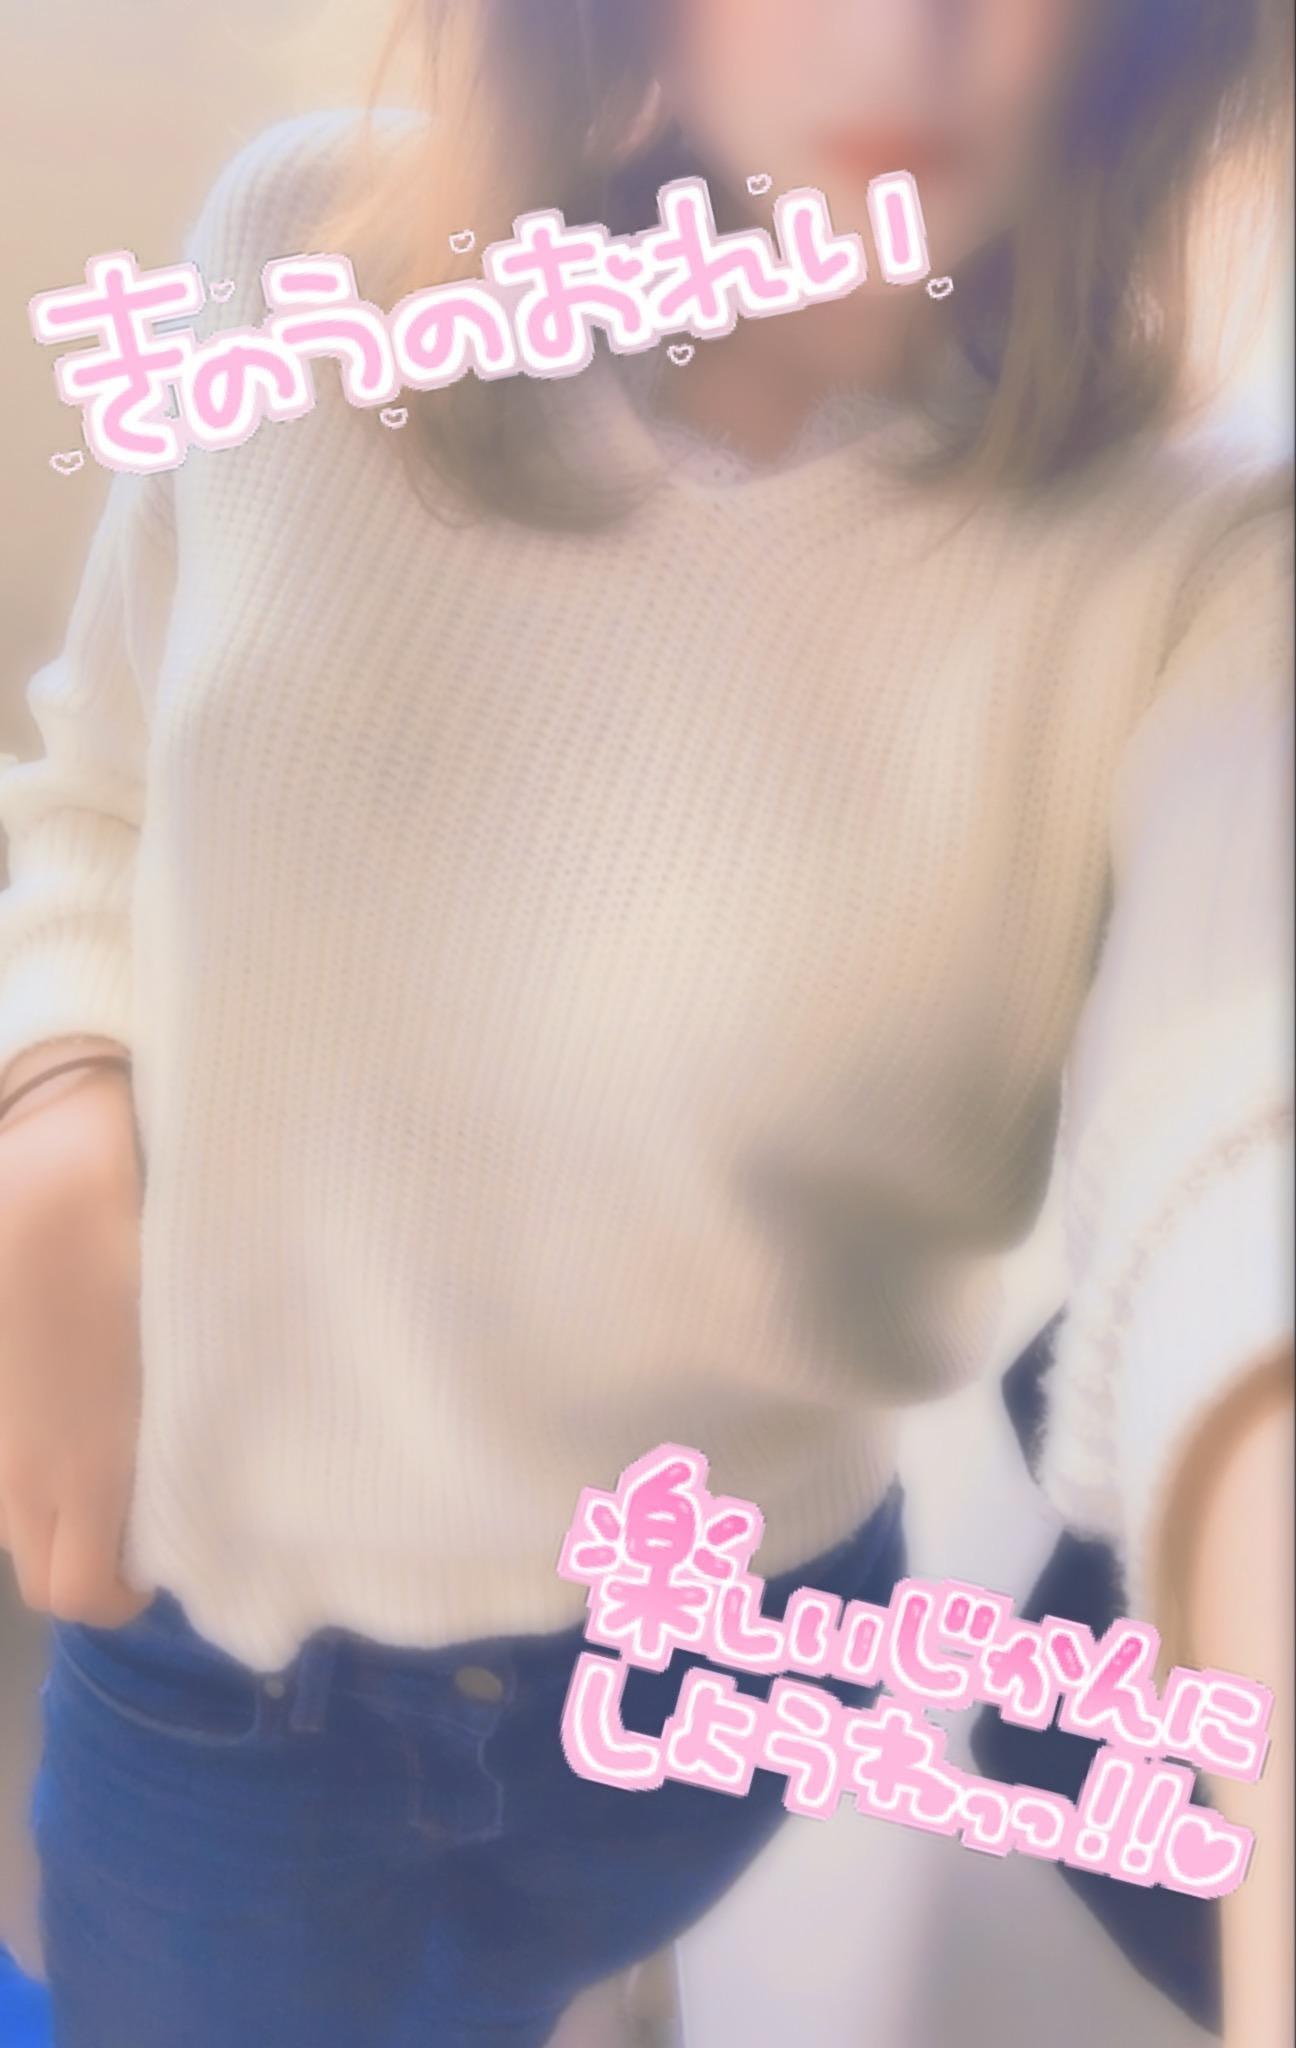 「☆Thank you☆」02/20(02/20) 09:48 | くるみの写メ・風俗動画